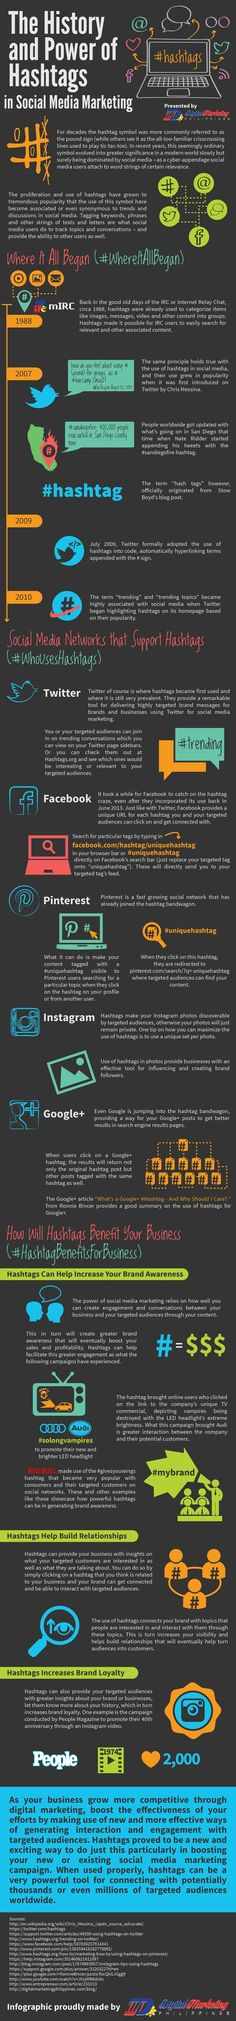 The History & Power of Hashtags in Social Media Marketing (via MakeUseOf.com):